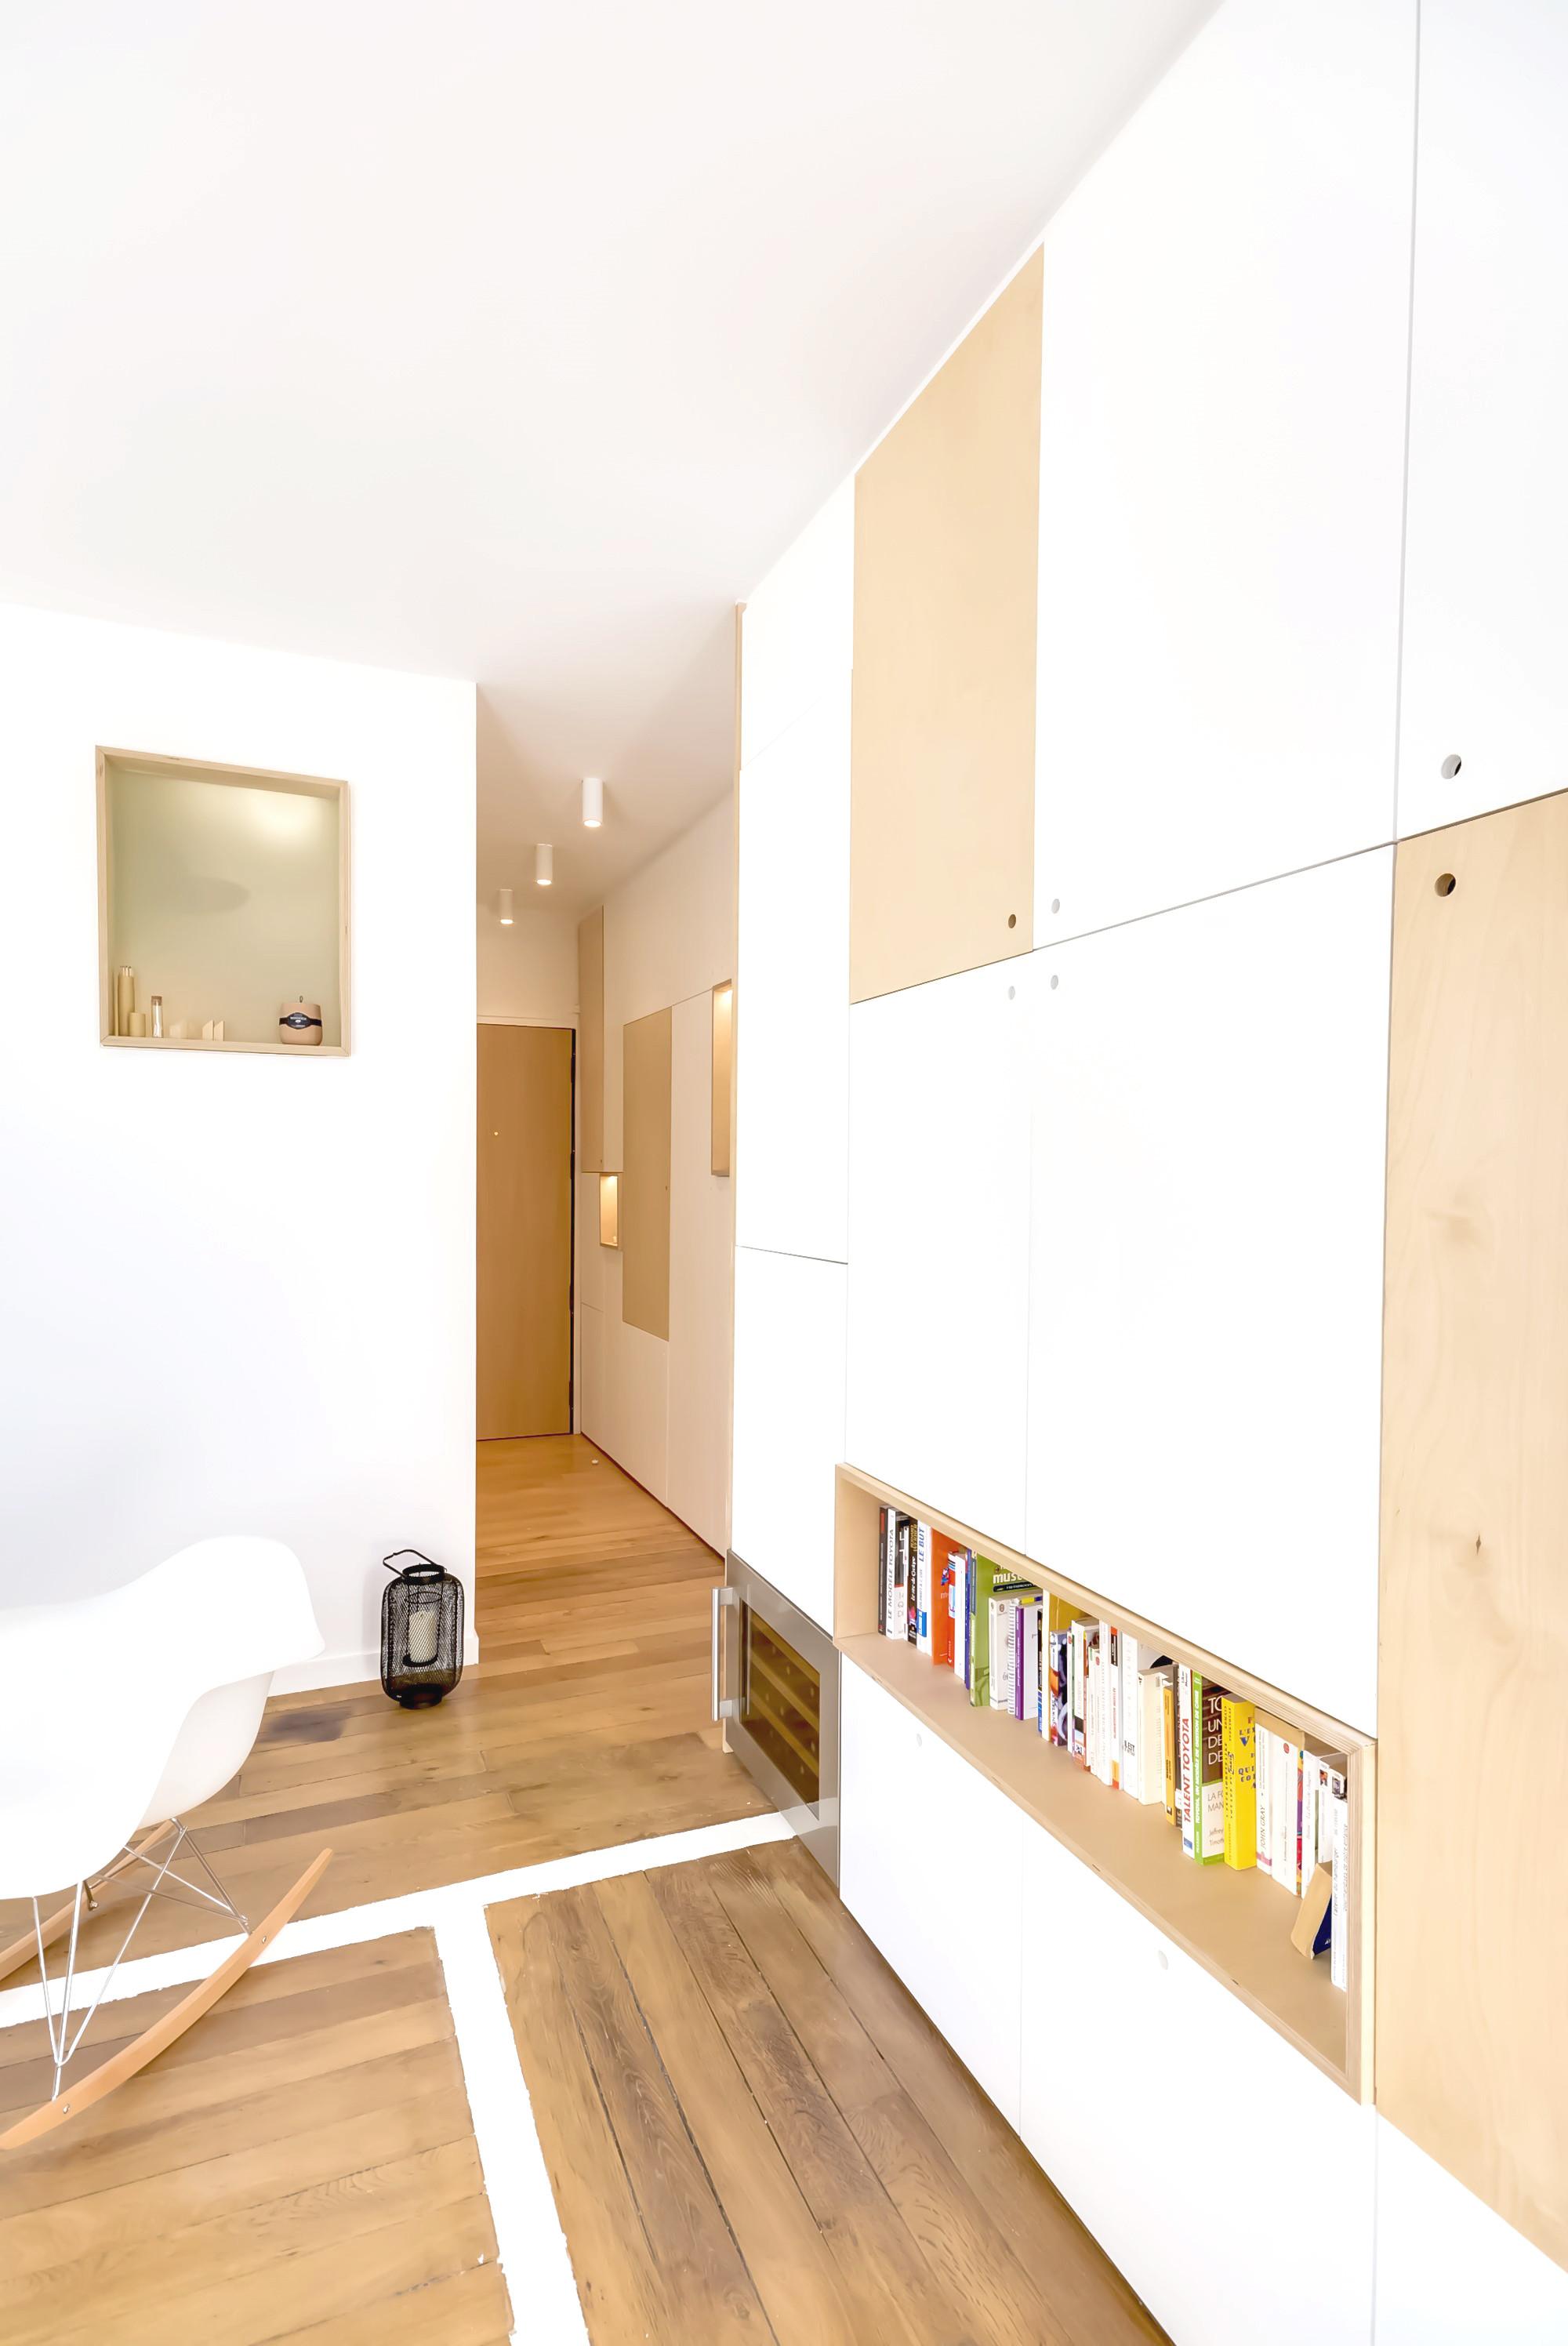 gallery of 30m2 flat in paris richard guilbault 12. Black Bedroom Furniture Sets. Home Design Ideas